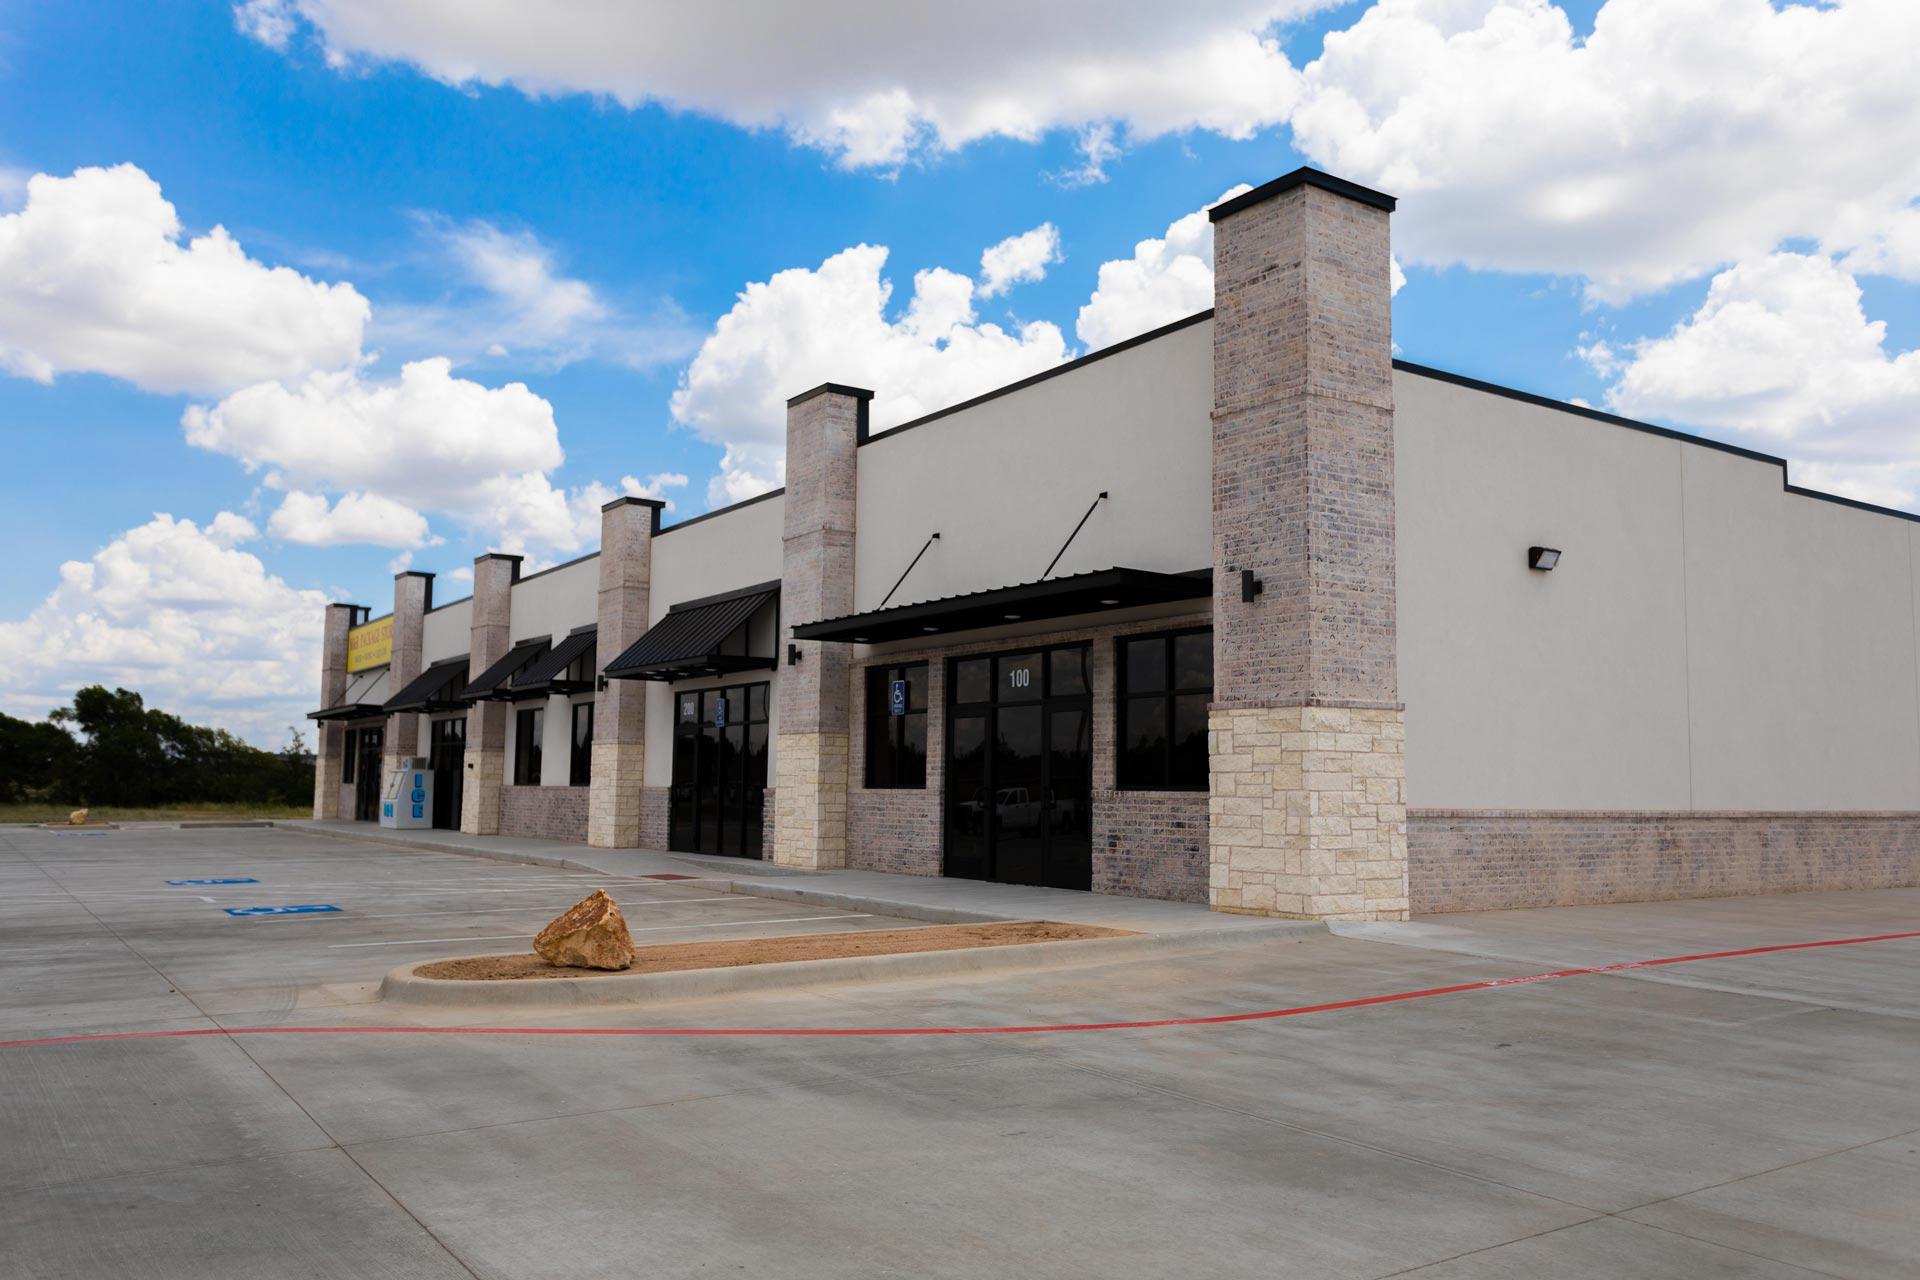 M_and_R_Liquor_Amarillo_ Building_4_Cole_Stanley